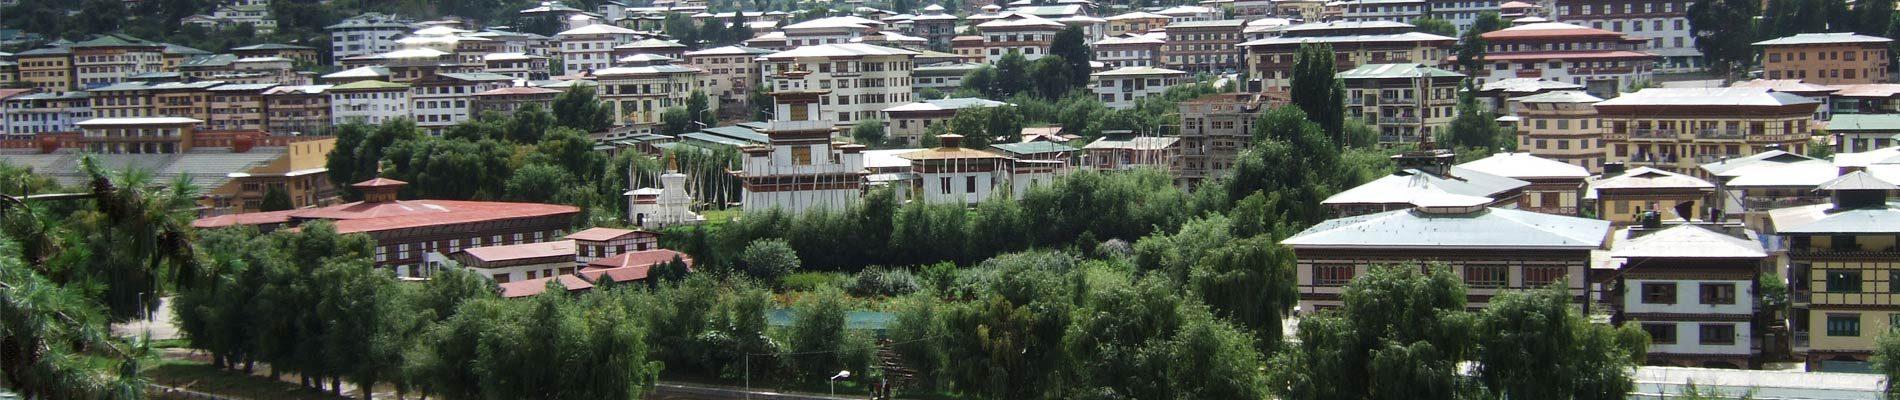 Bhutan: 4d Glimpse of Bhutan